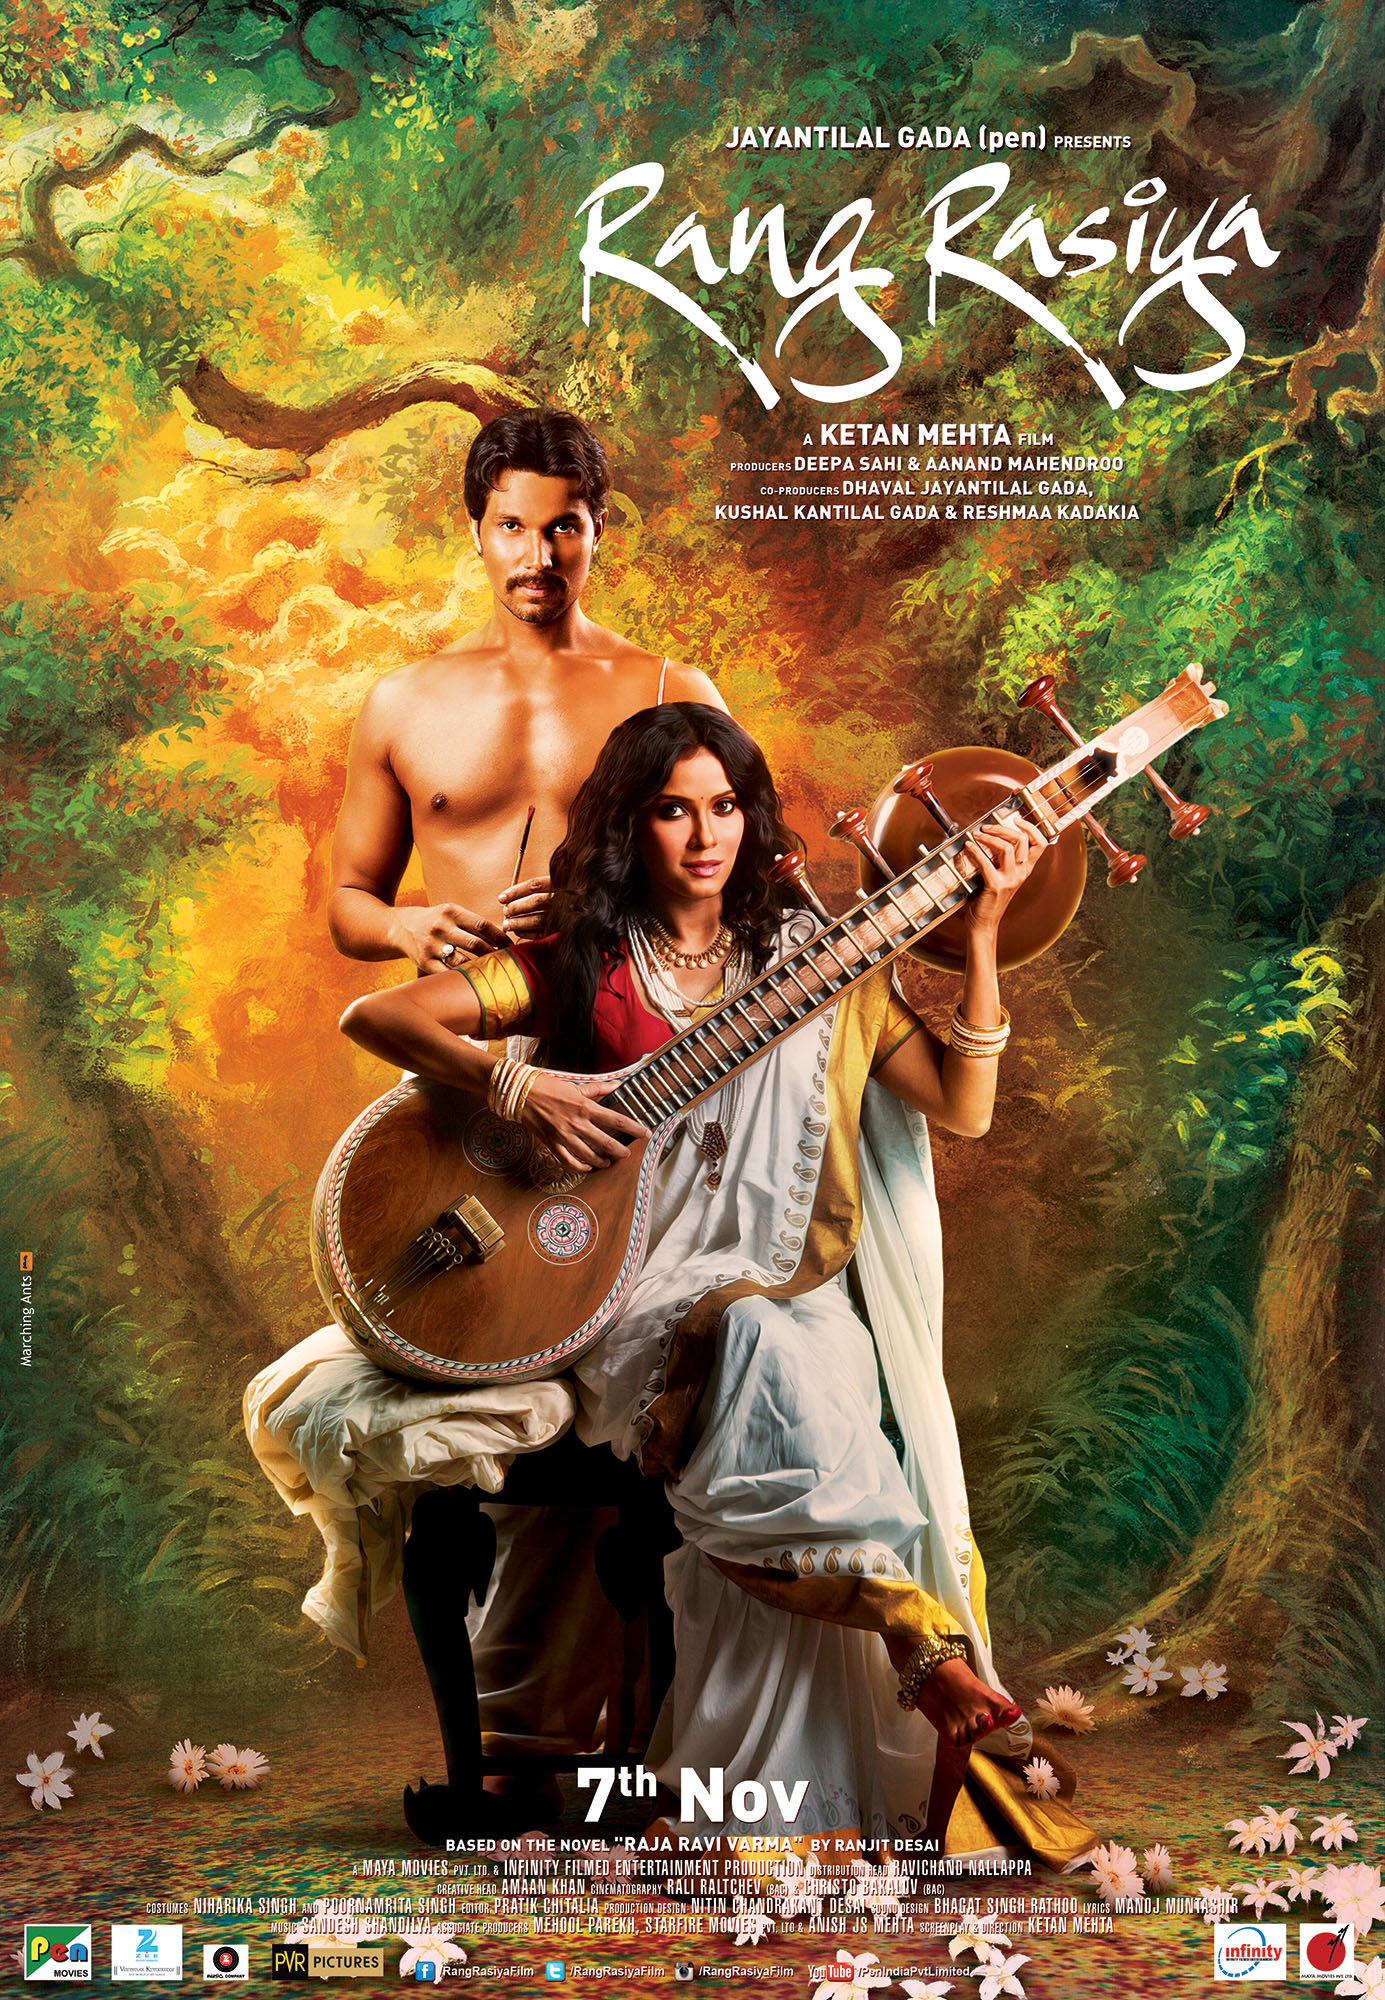 Rang Rasiya: A movie about father of modern Indian art Raja Ravi Varma